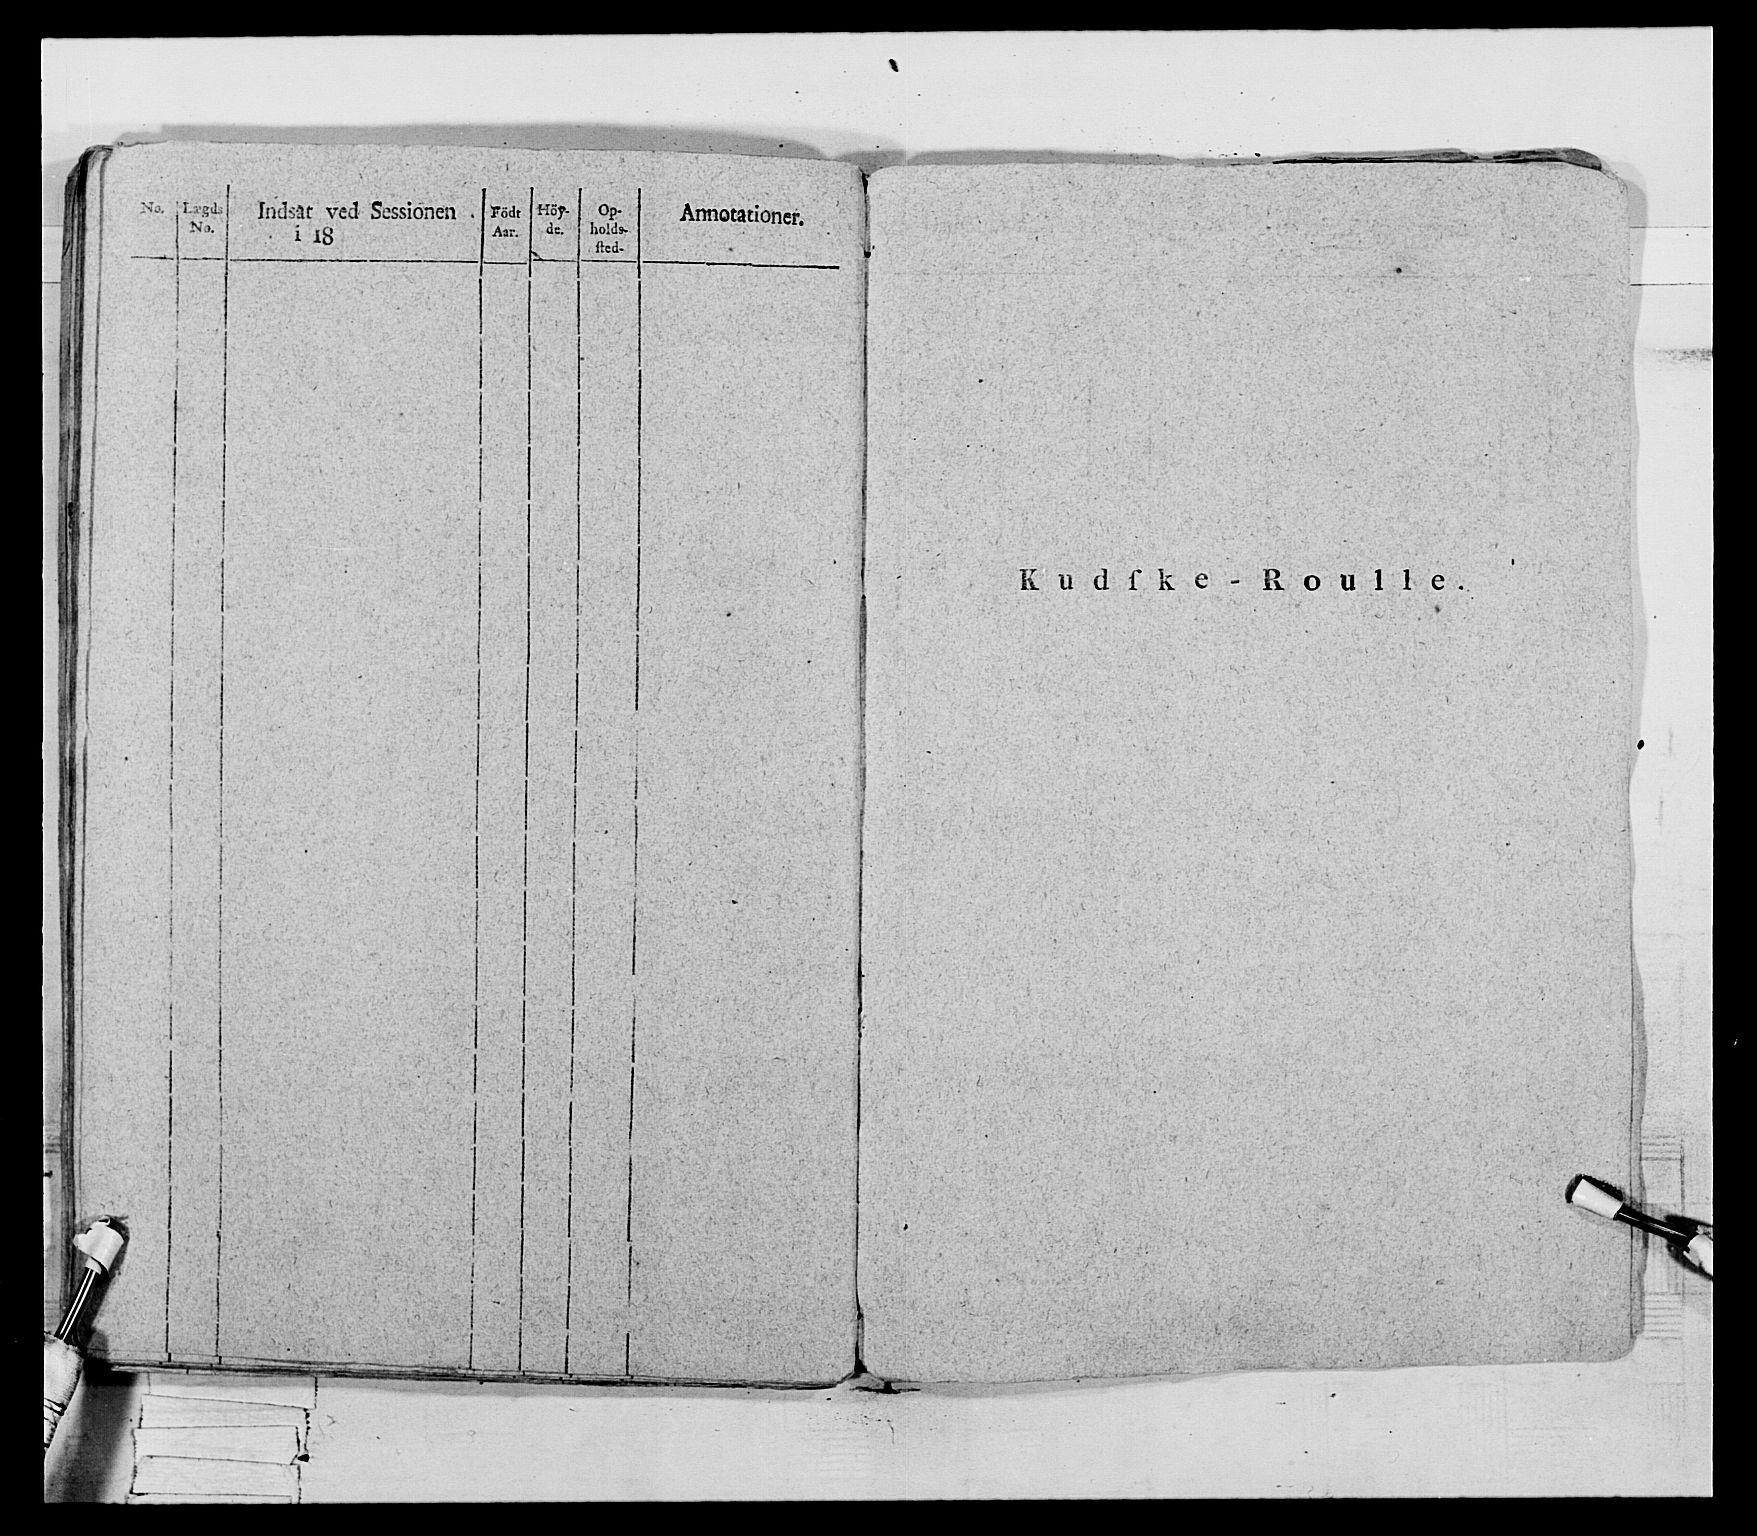 RA, Generalitets- og kommissariatskollegiet, Det kongelige norske kommissariatskollegium, E/Eh/L0069: Opplandske gevorbne infanteriregiment, 1810-1818, s. 103